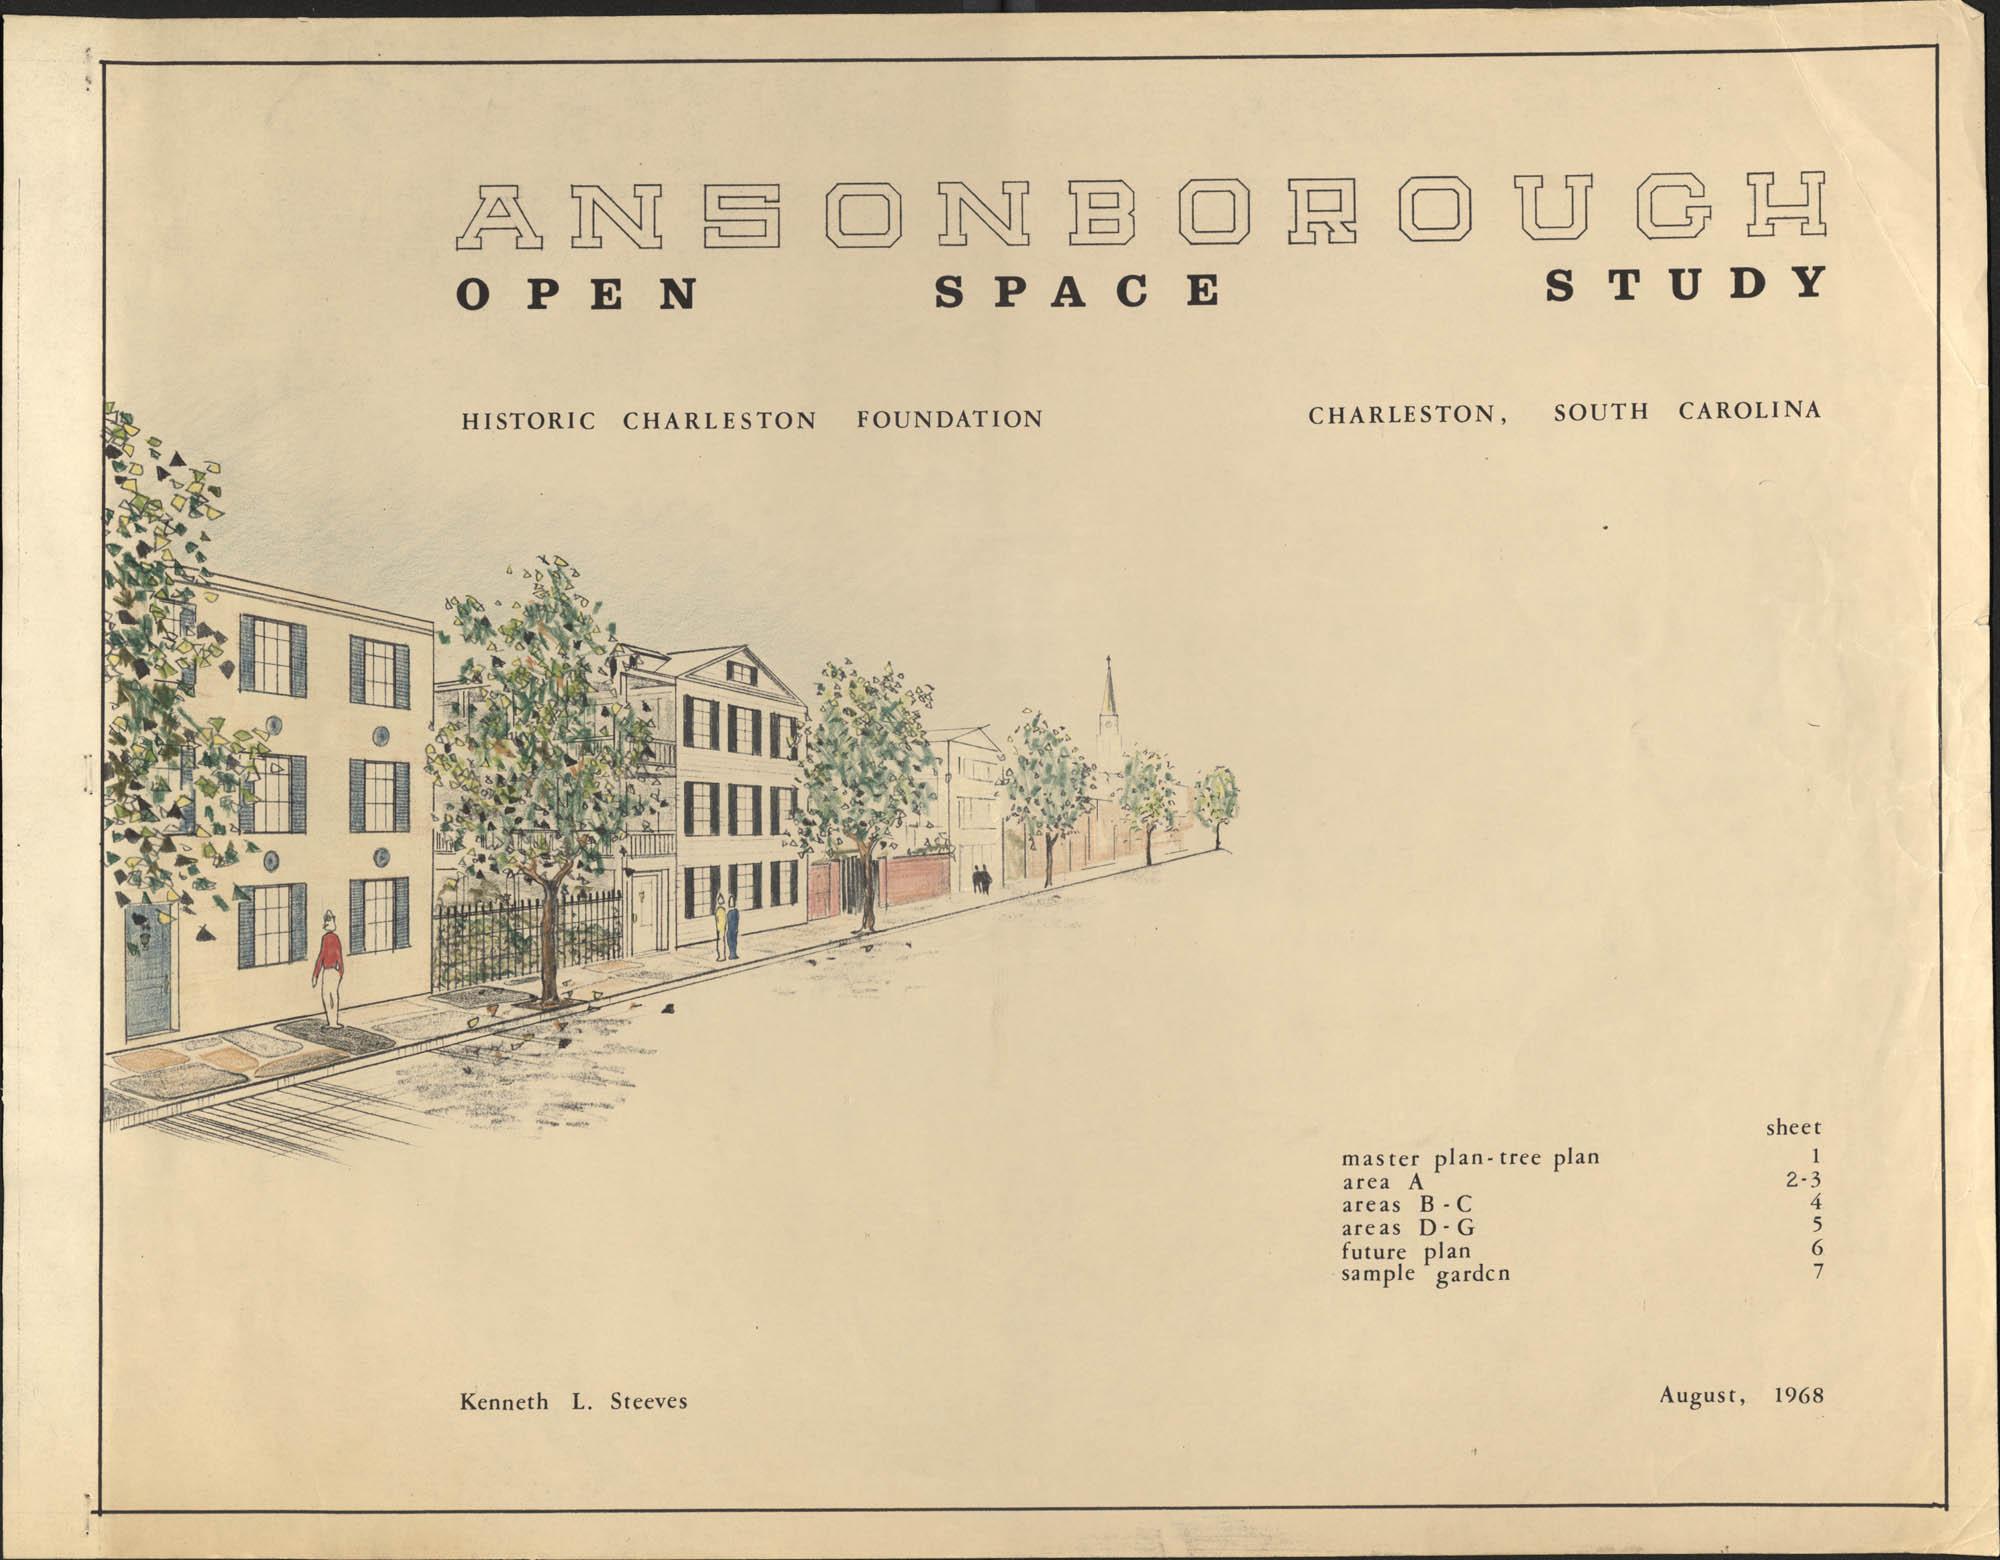 Ansonborough Open Space Study